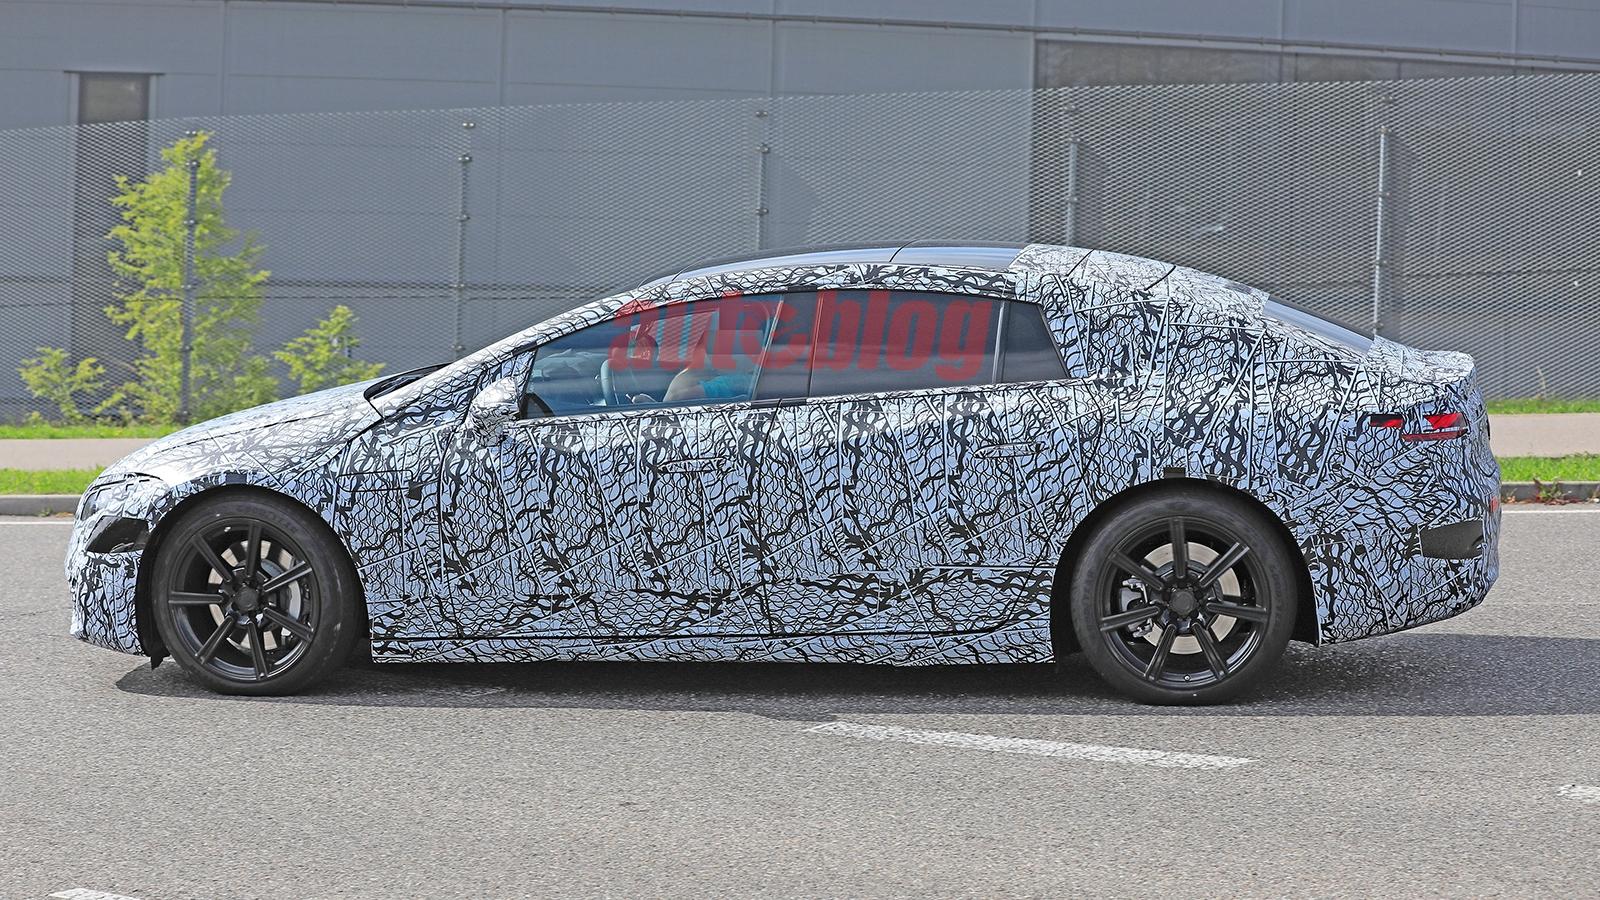 Mercedes EQS nuove foto spia interni